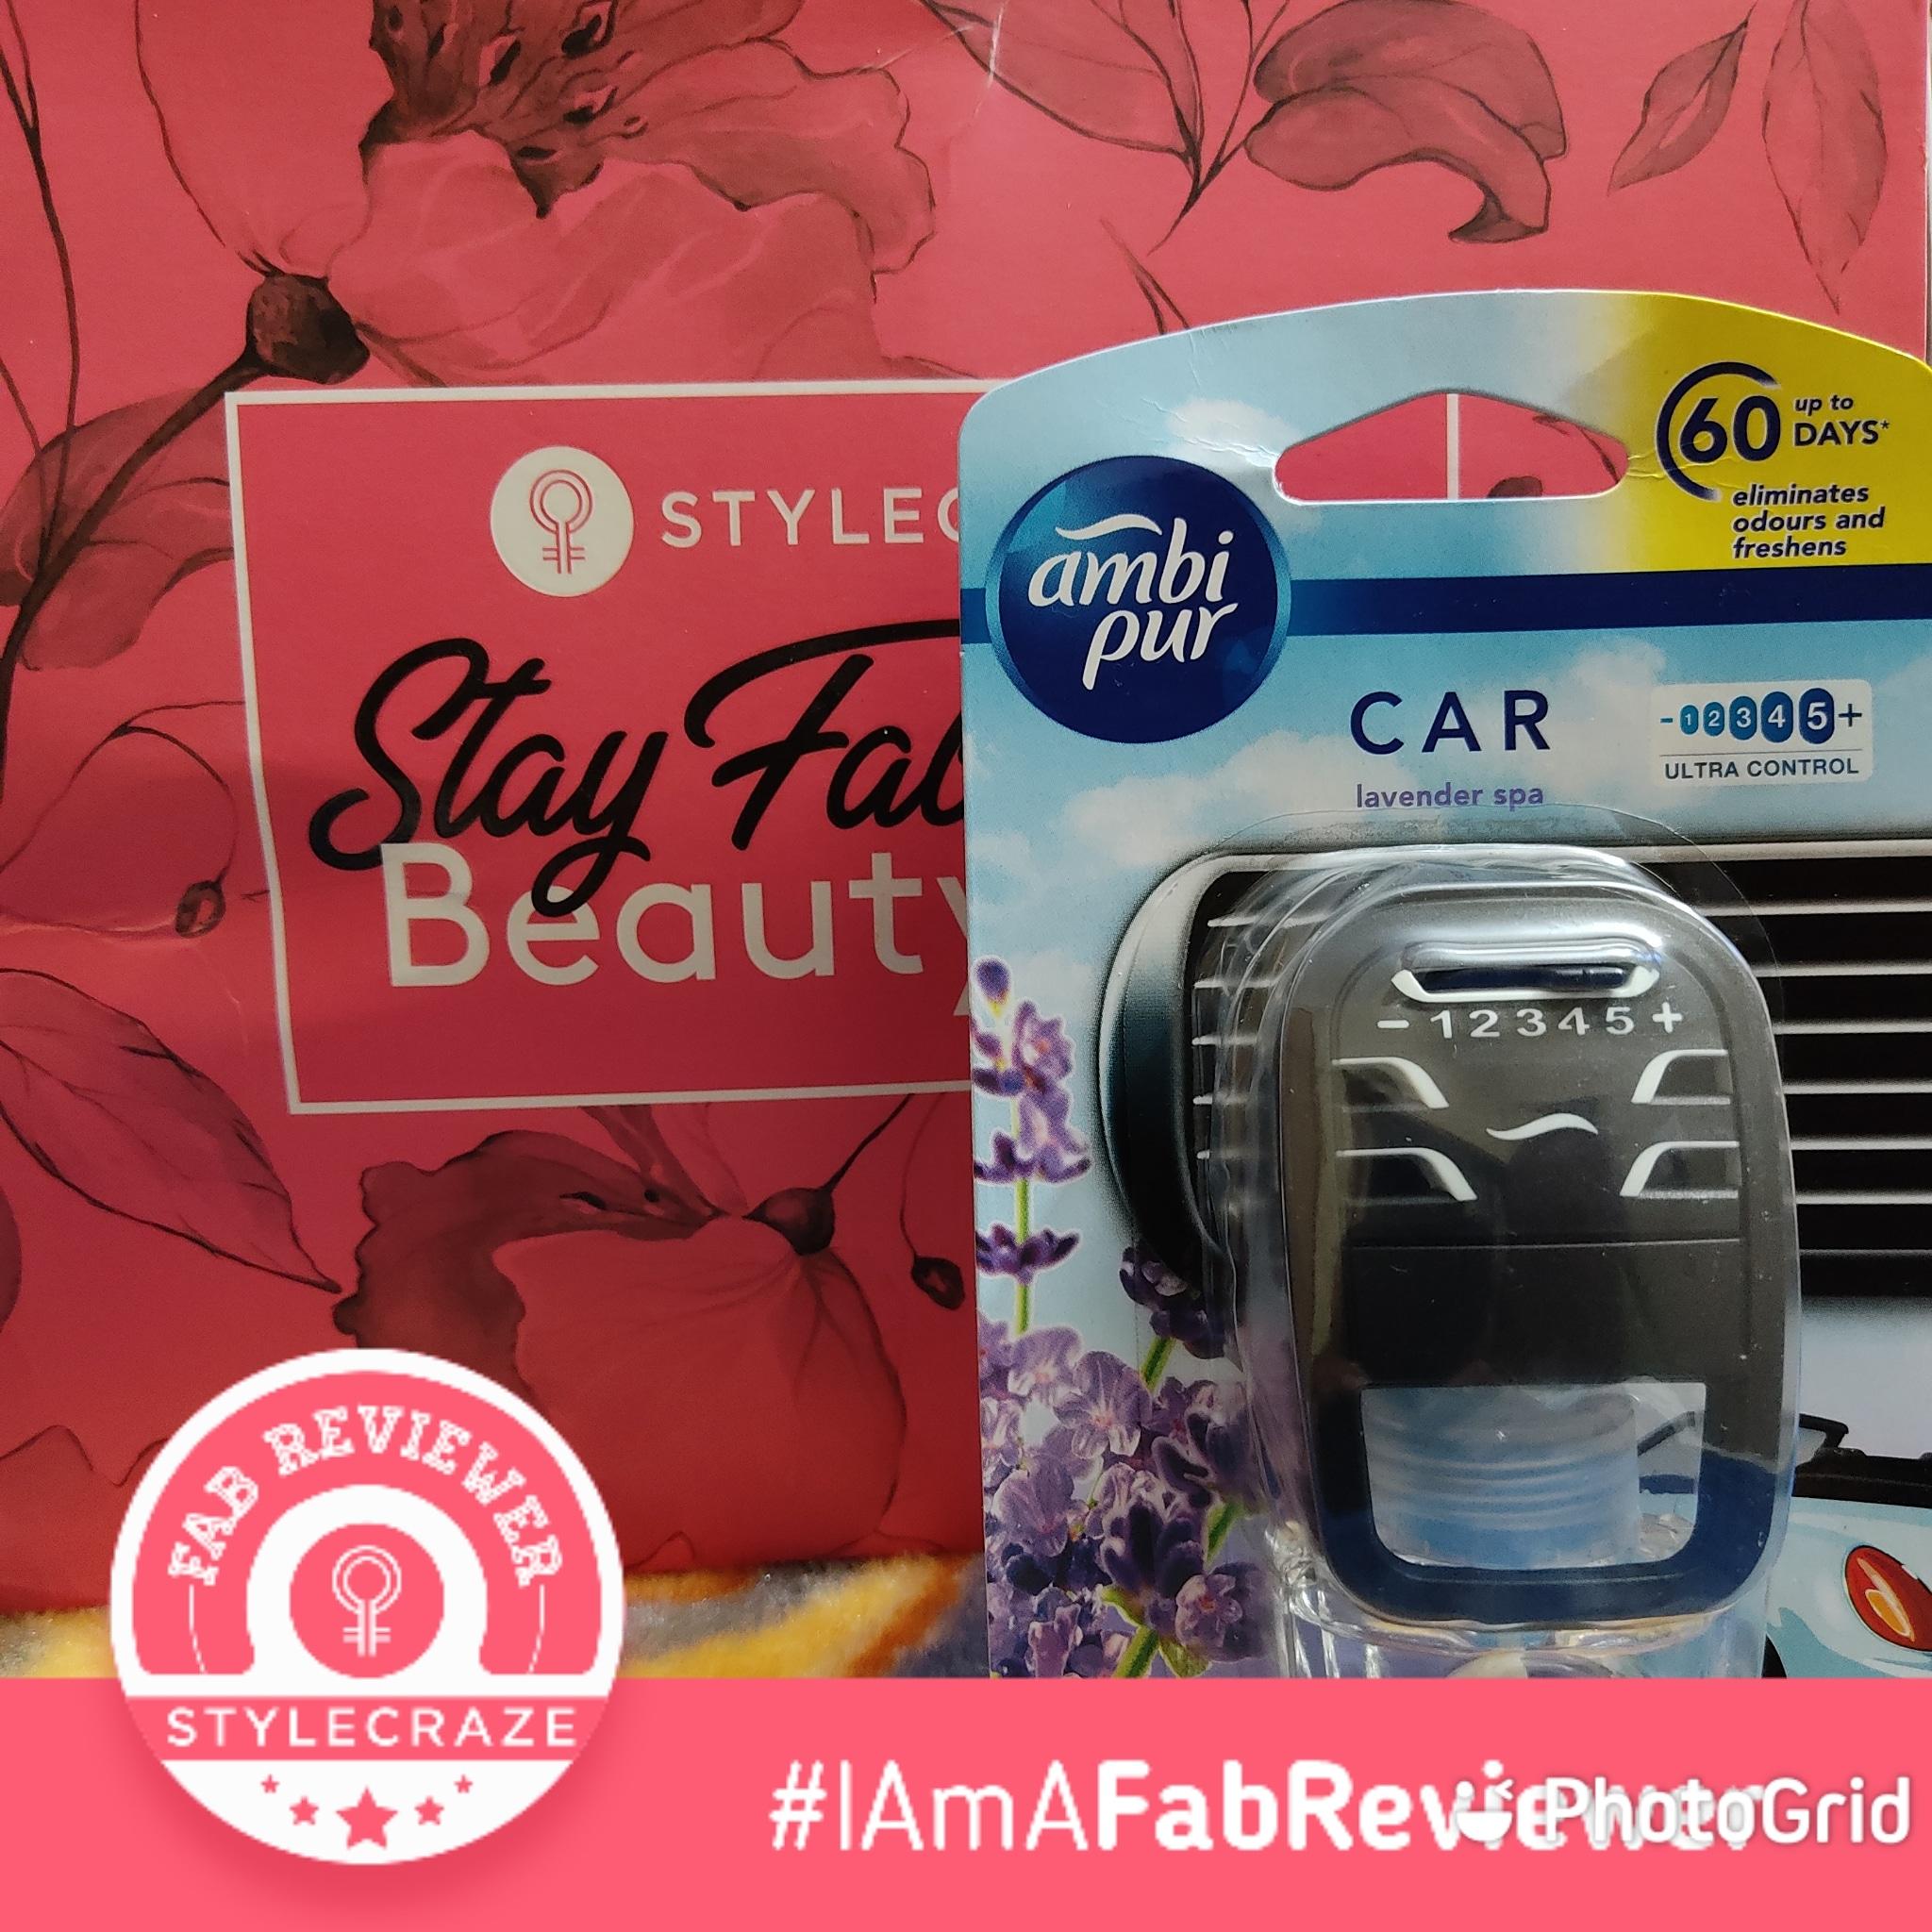 Ambipur Car Air Freshener Lavender Spa-Makes fresh and breathing environment-By navbamrah